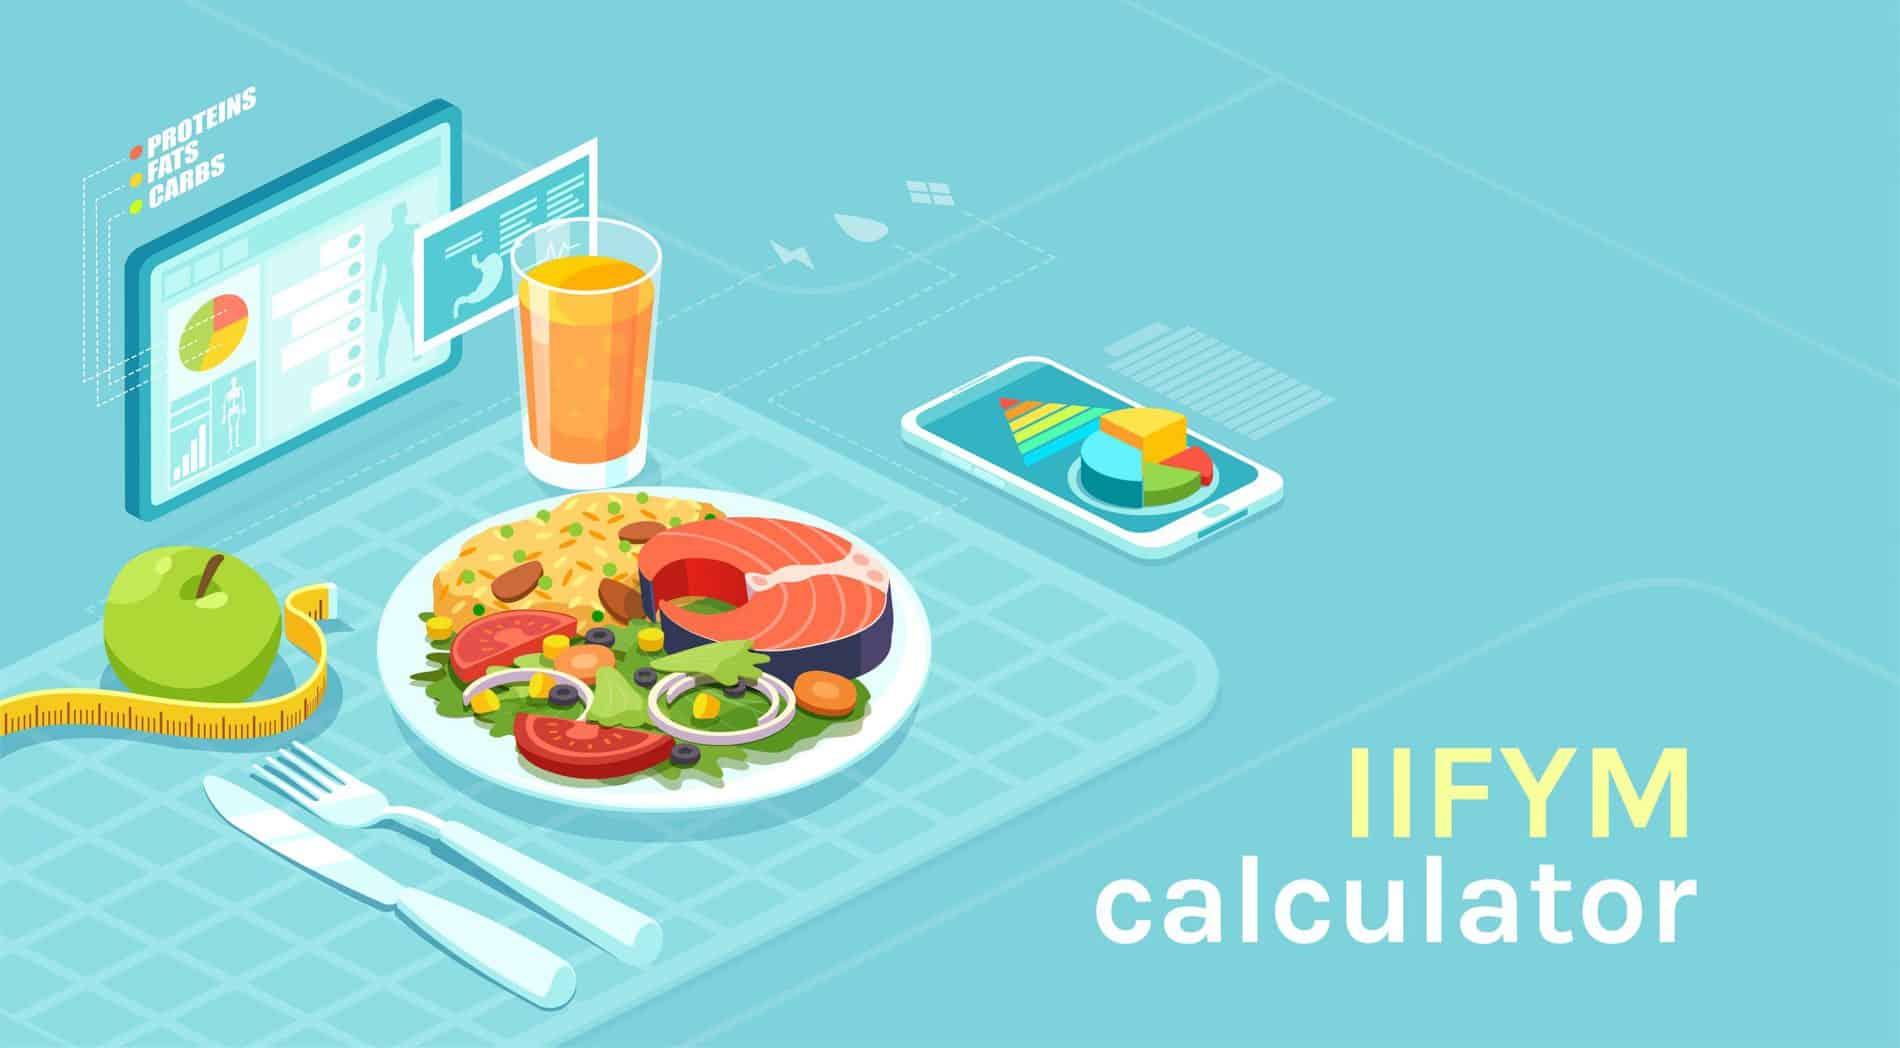 IIFYM calculator